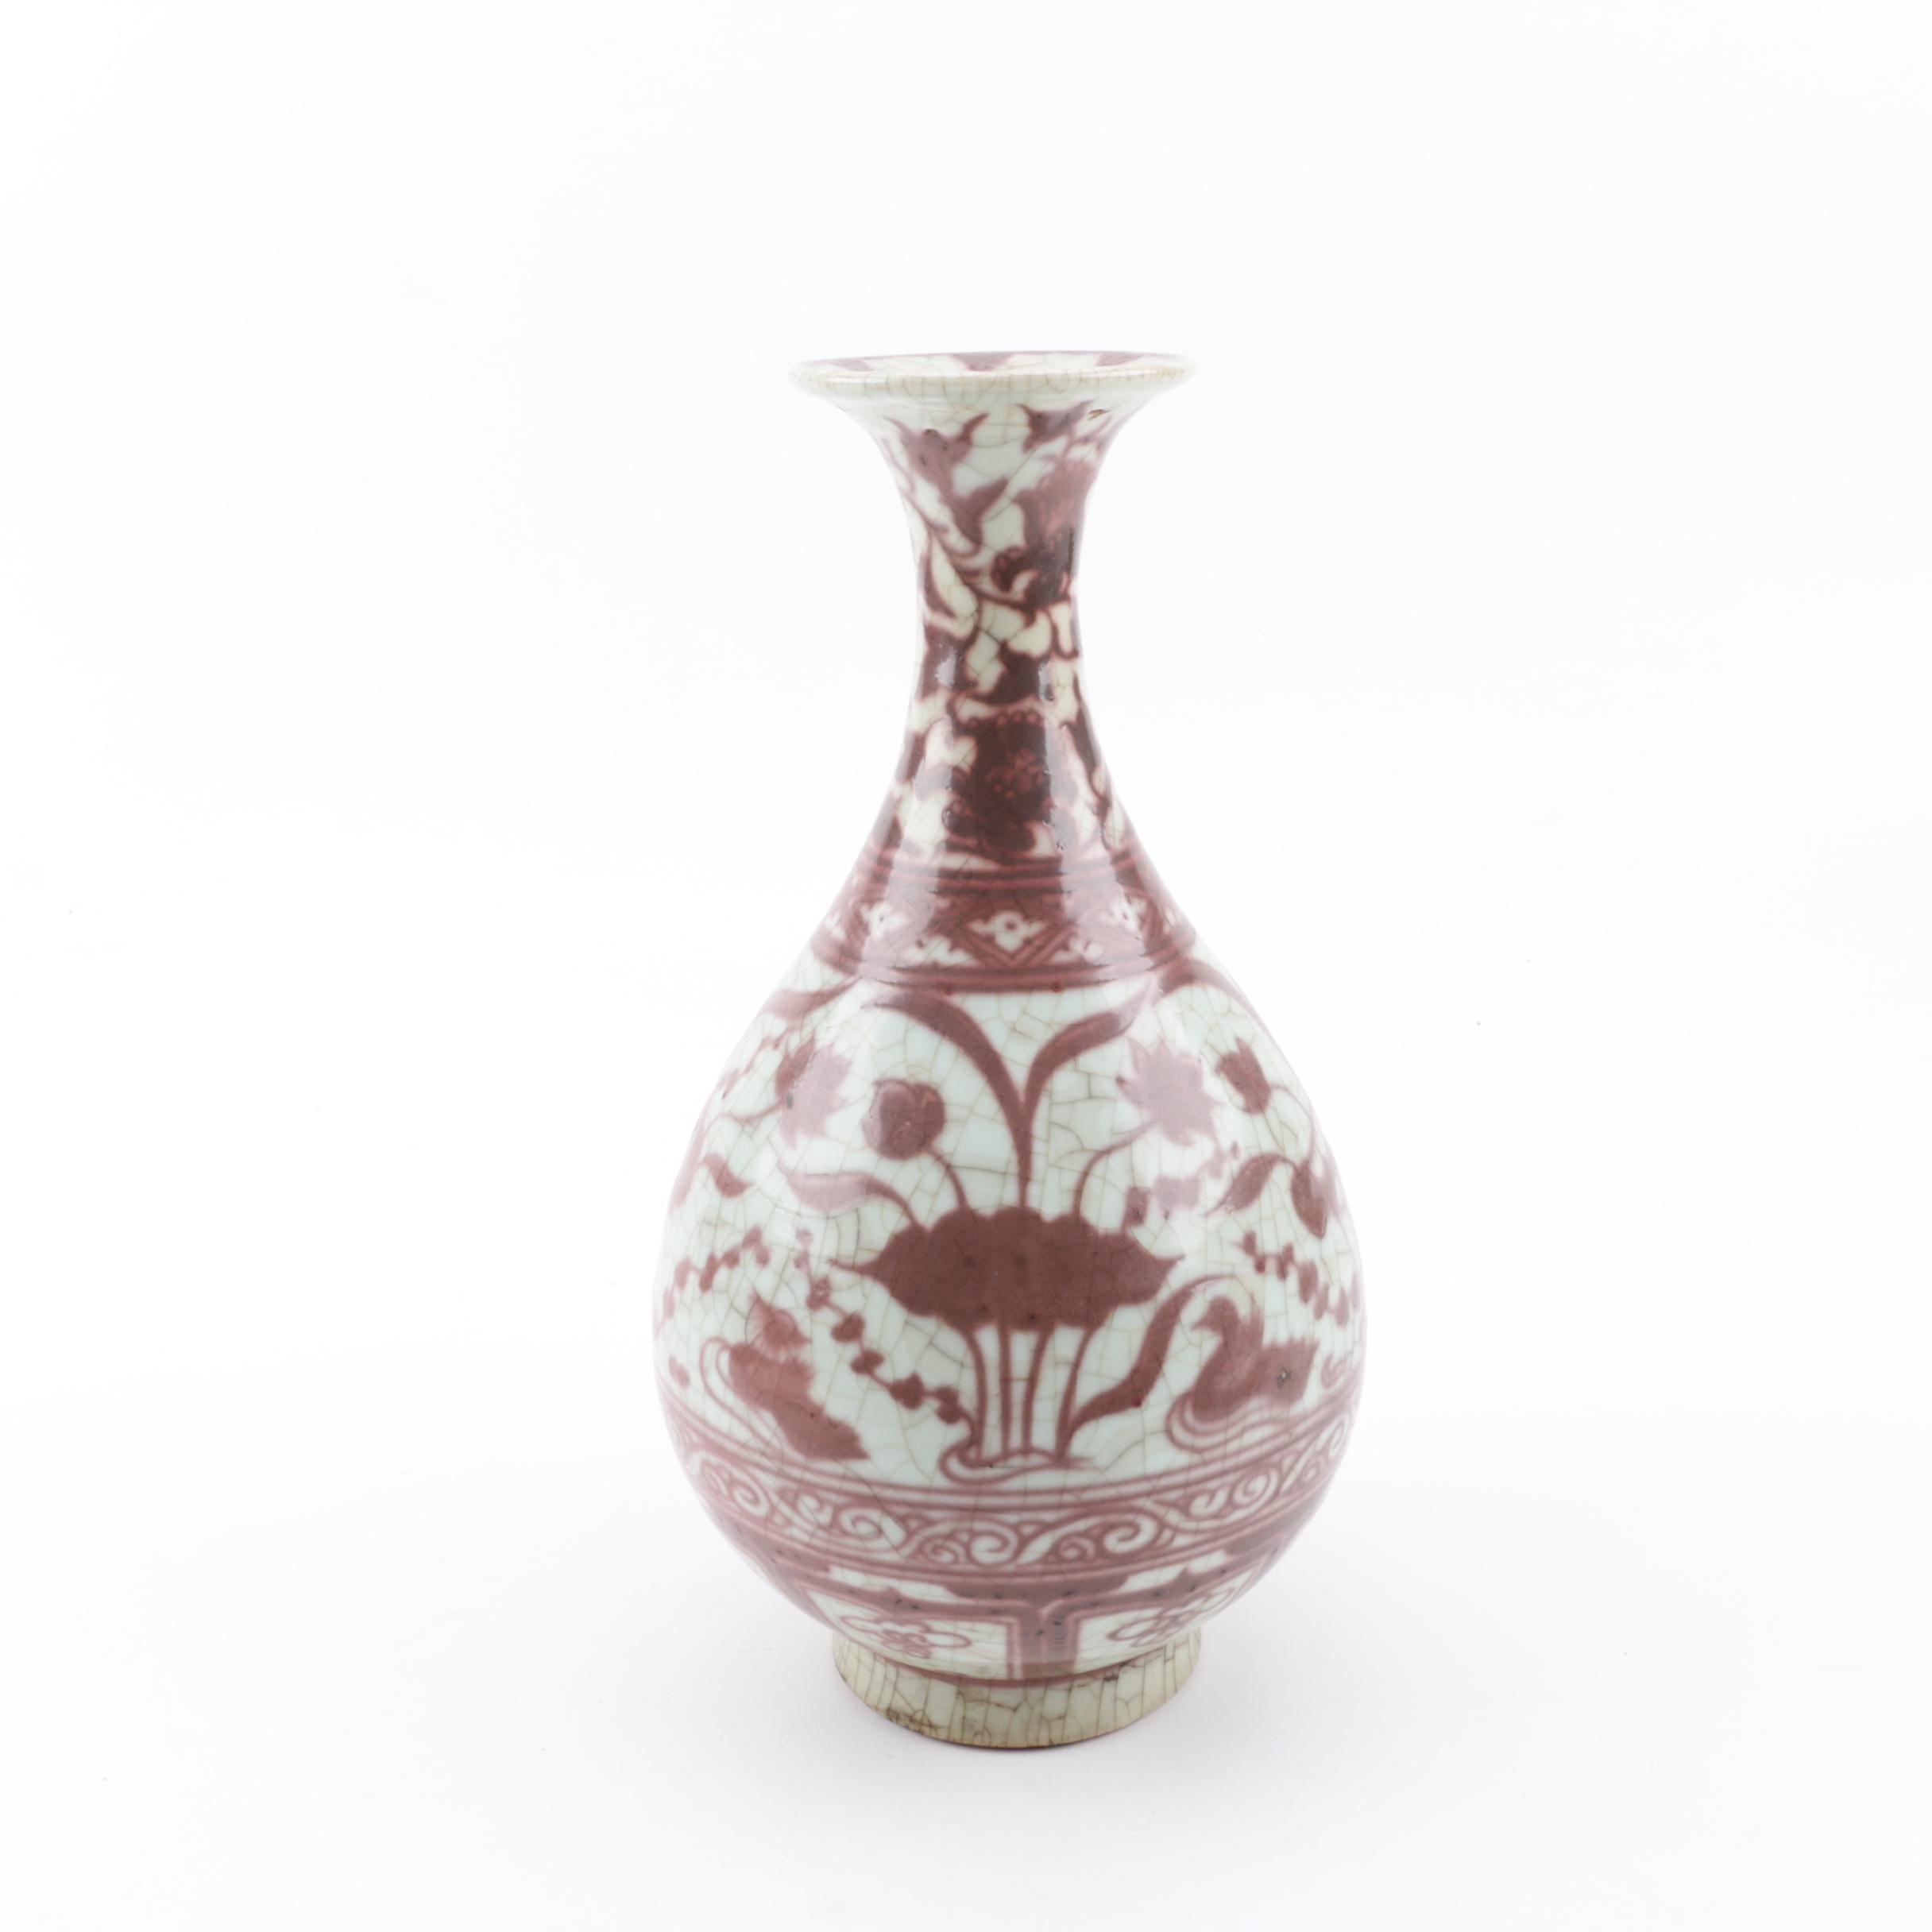 Vintage Chinese Earthenware Vase